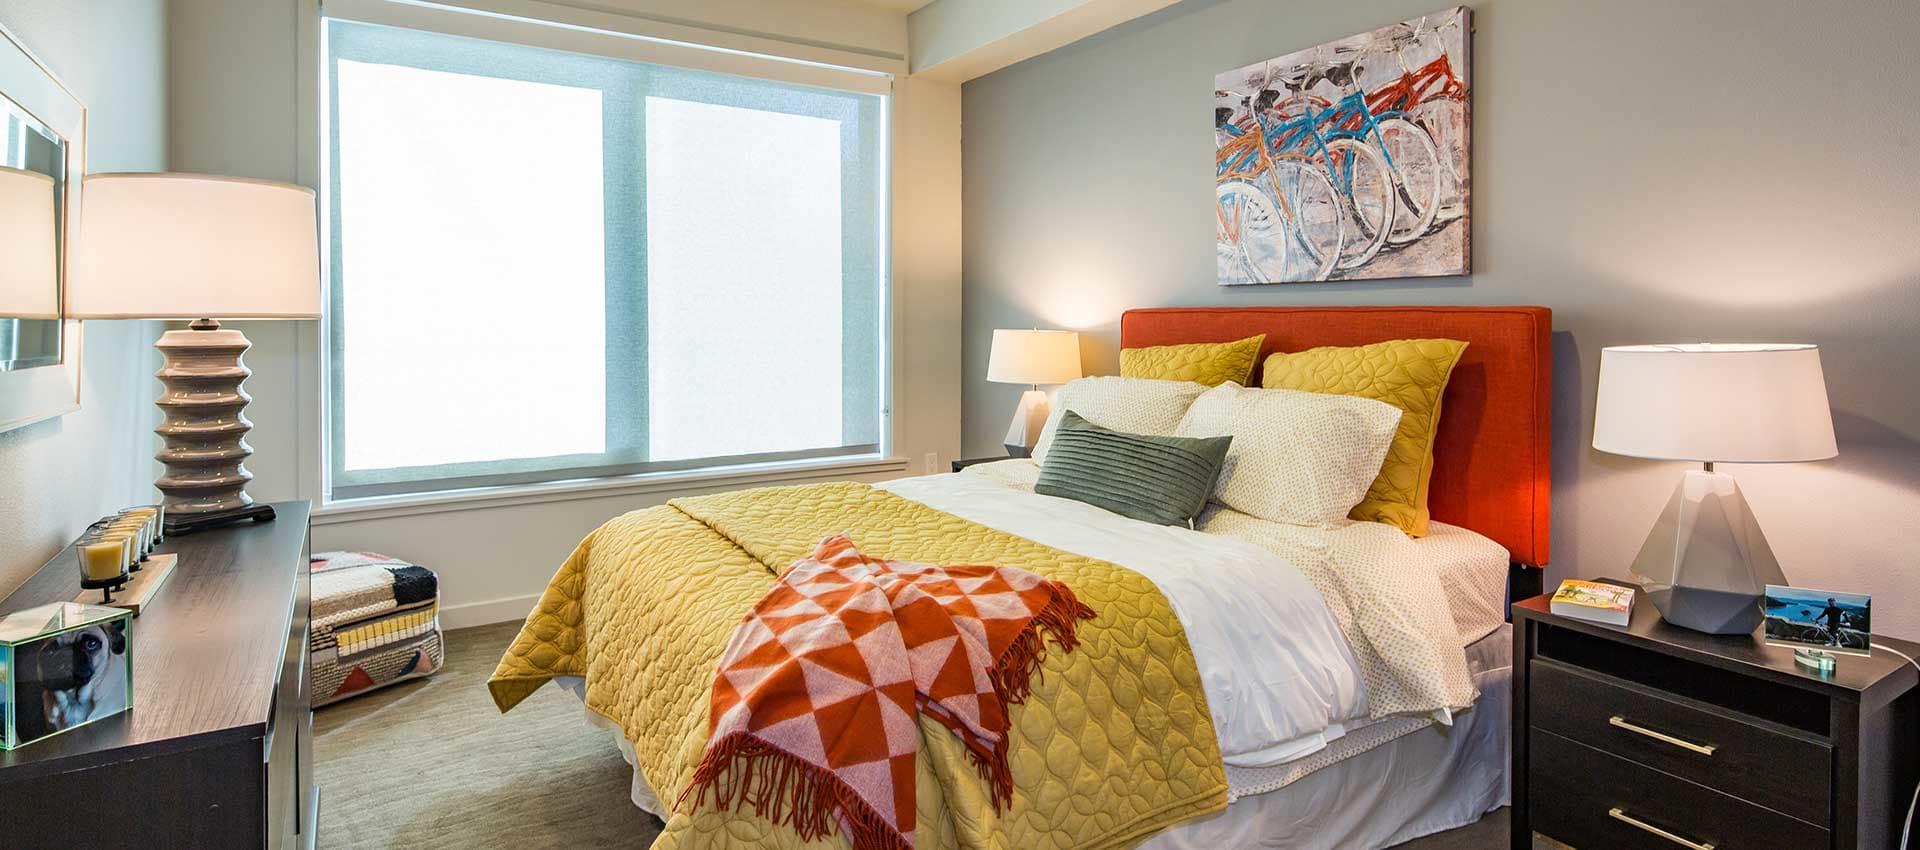 Bedroom at EVIVA Midtown in Sacramento, California